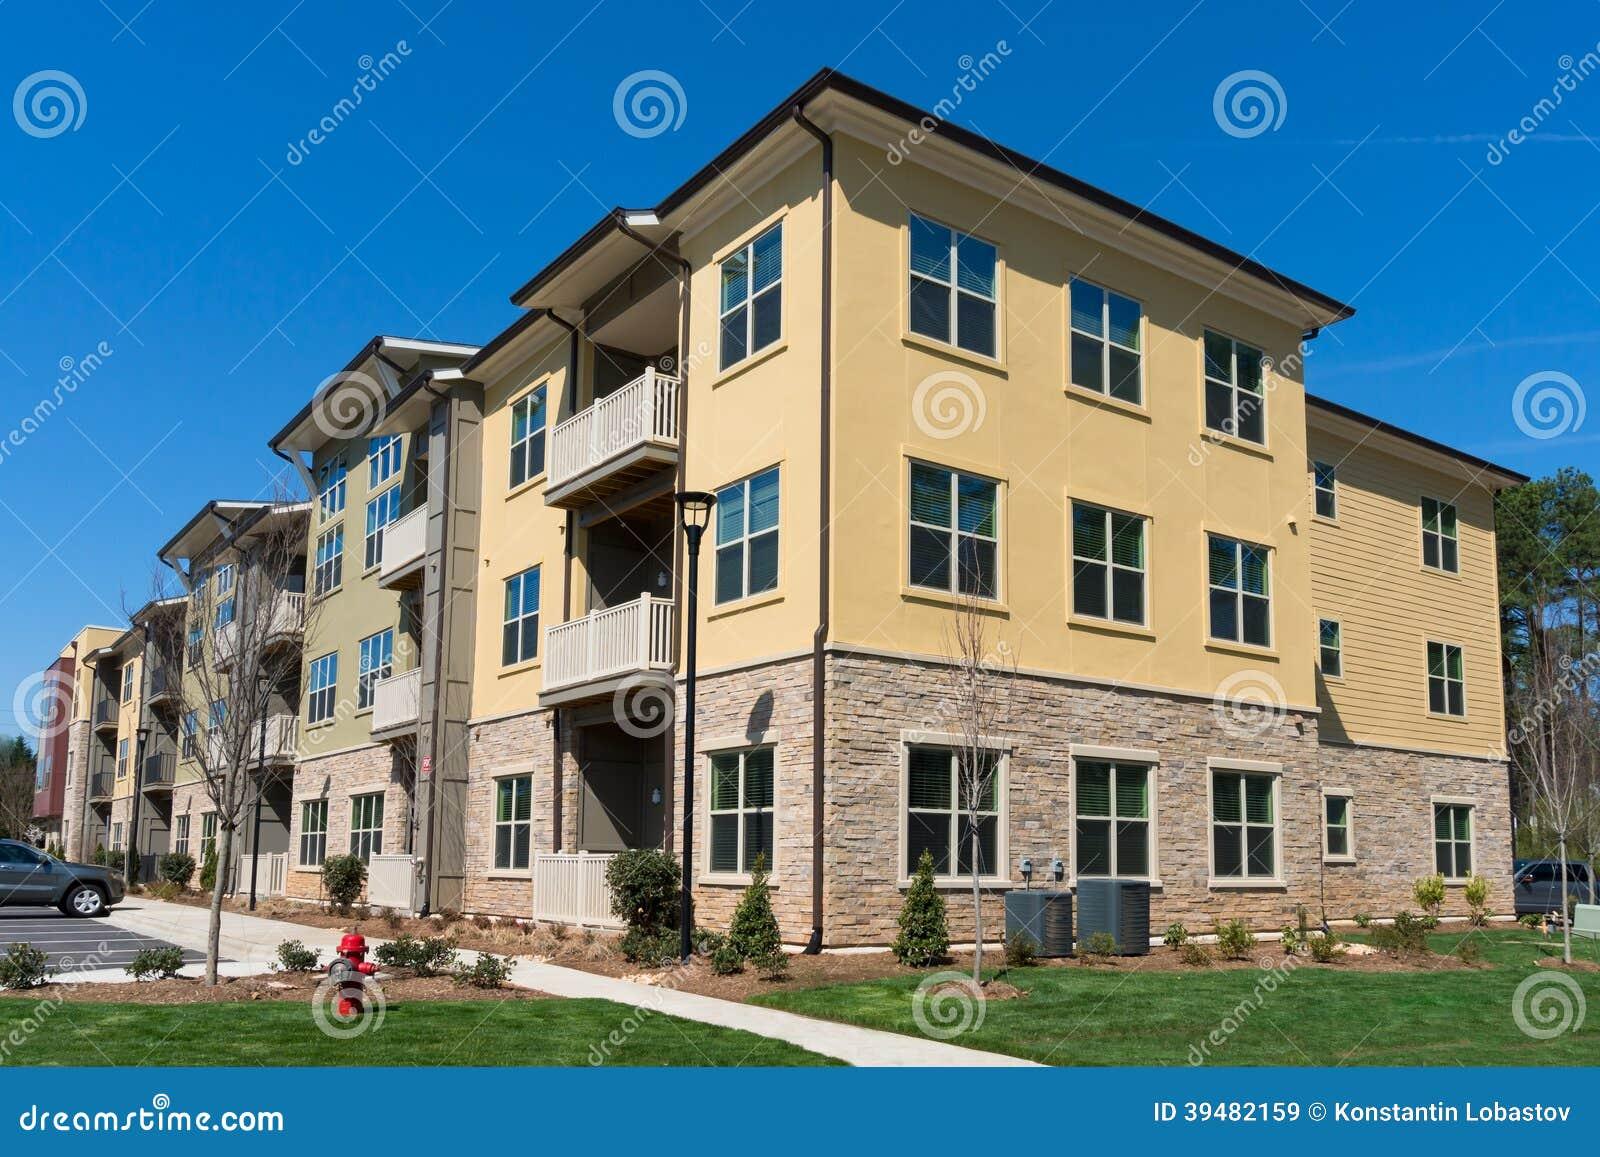 Appartementkomplexäußeres